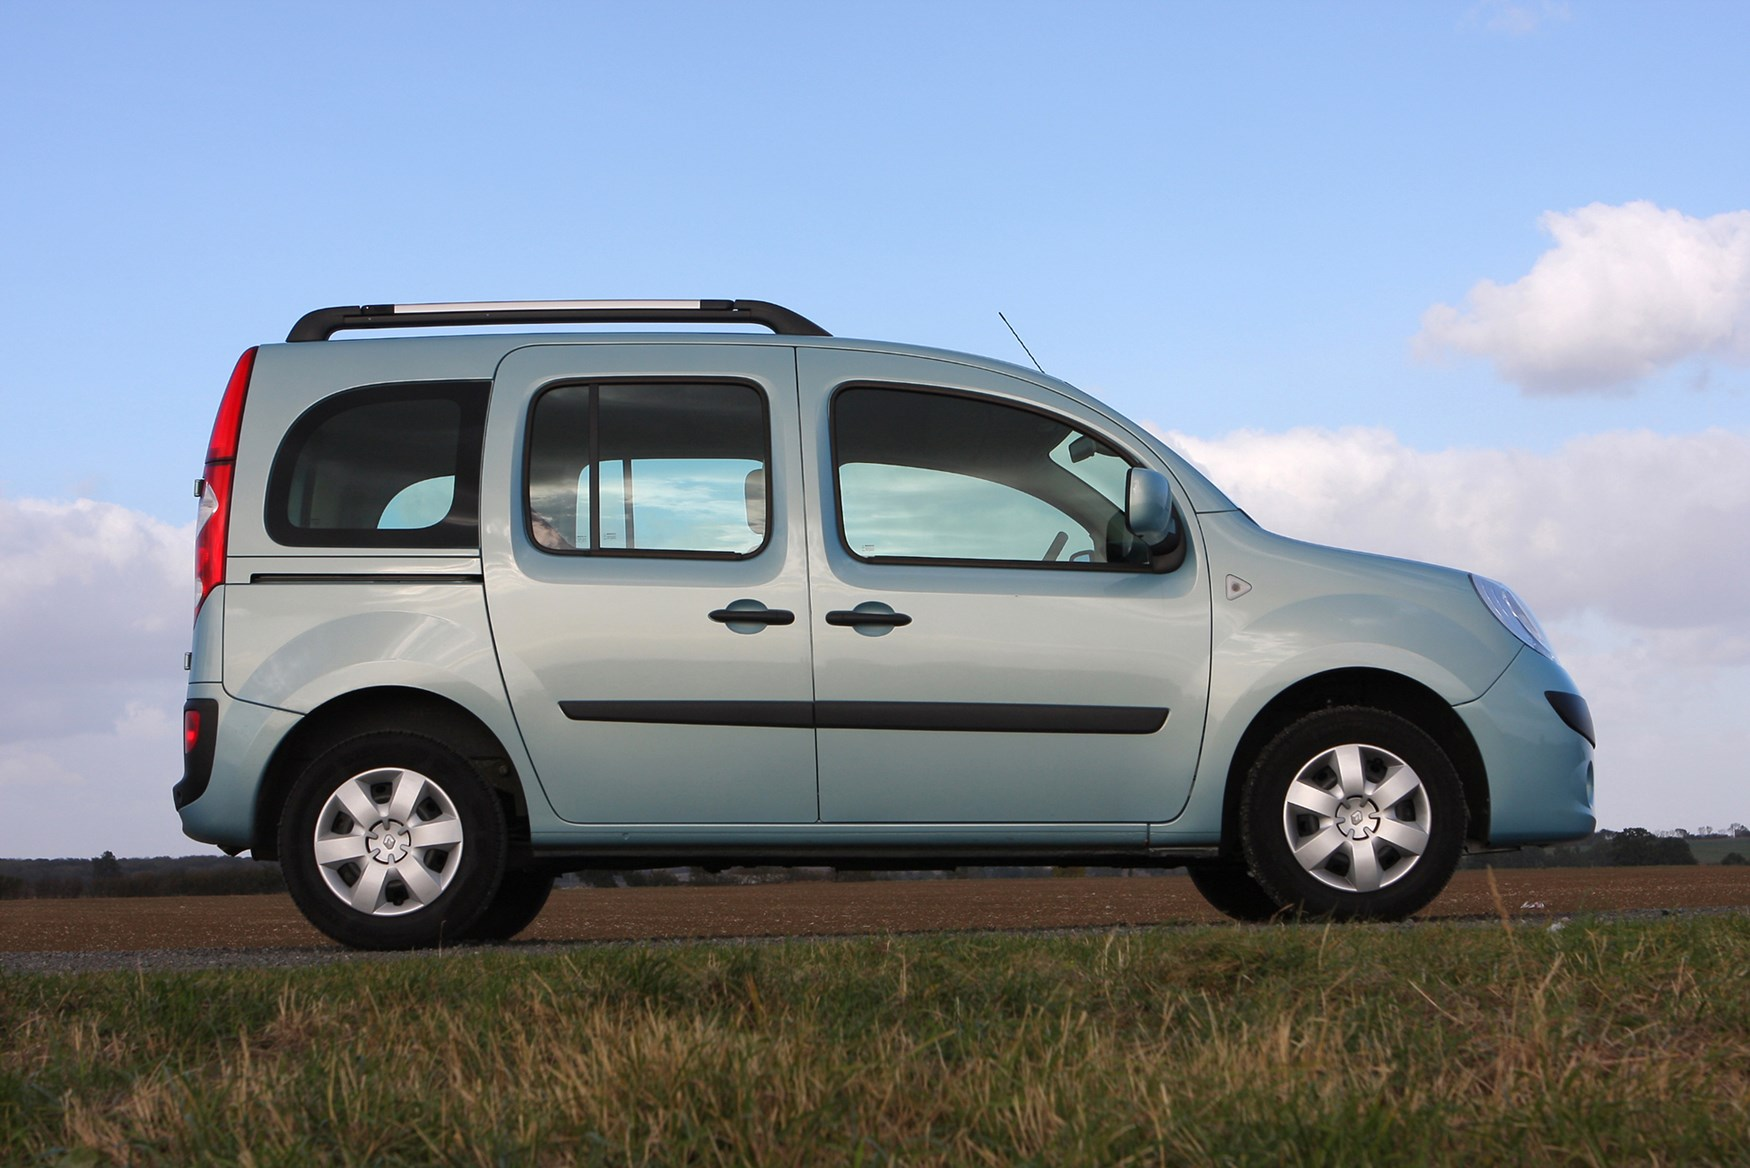 Машины похожие на Лада Ларгус - Renault Kangoo